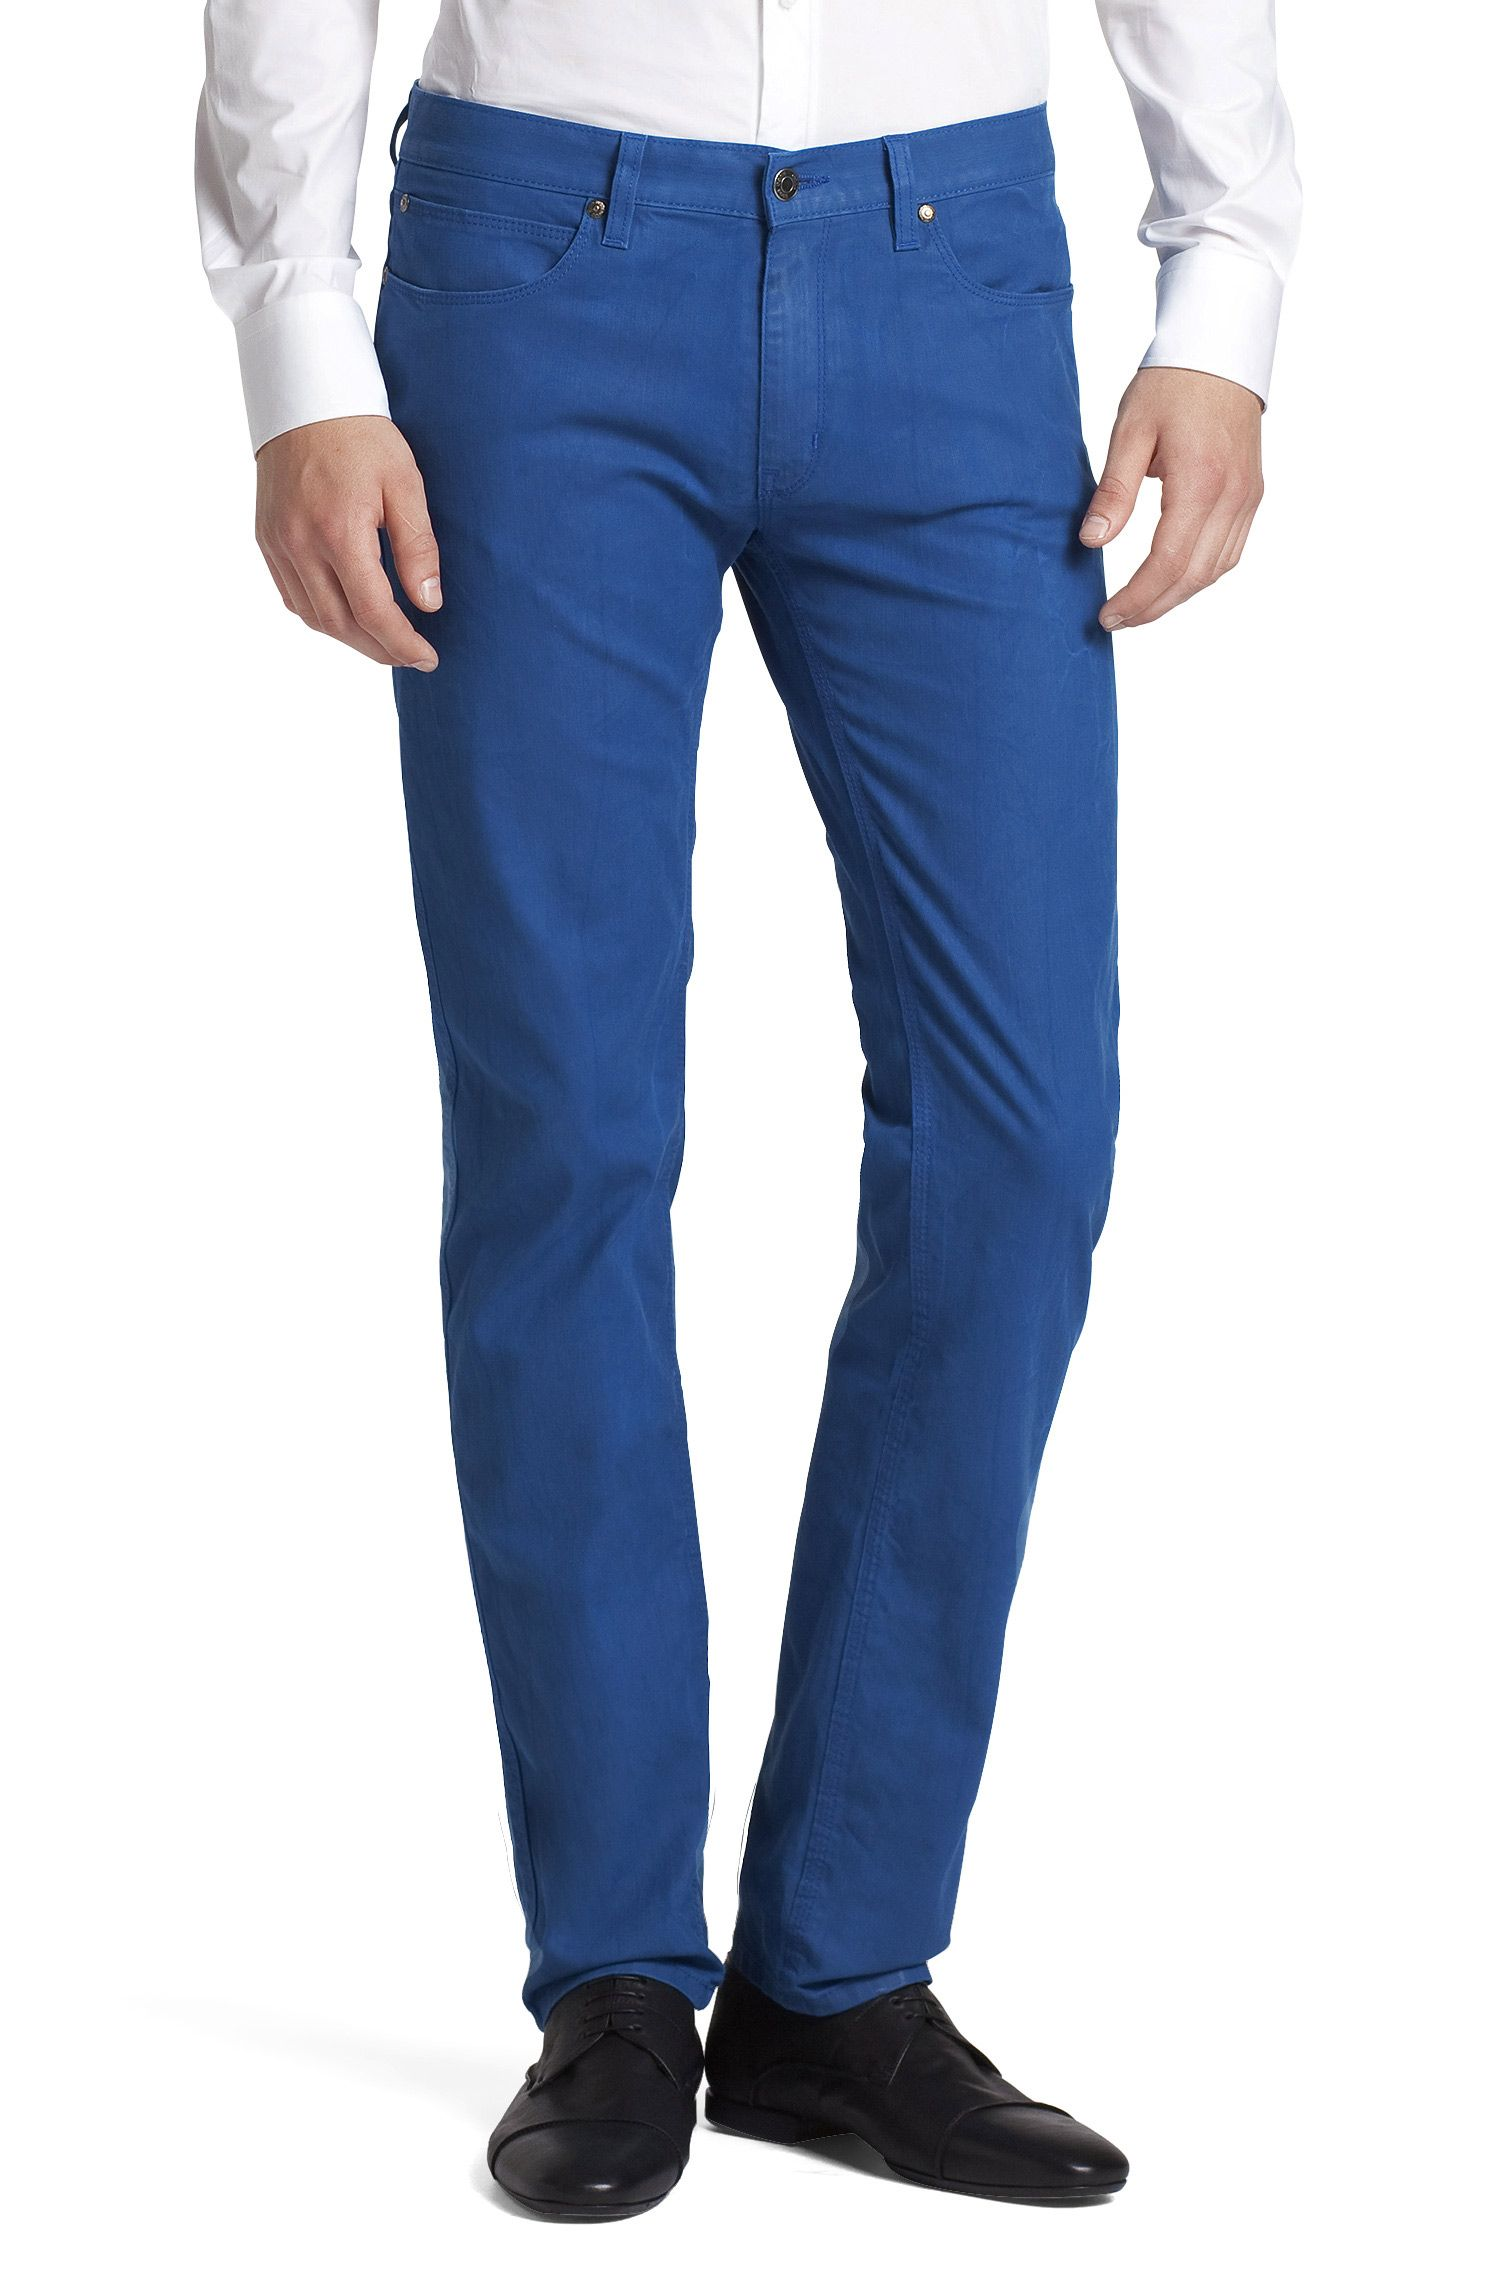 Jeans 'HUGO 708' met glanzende finish